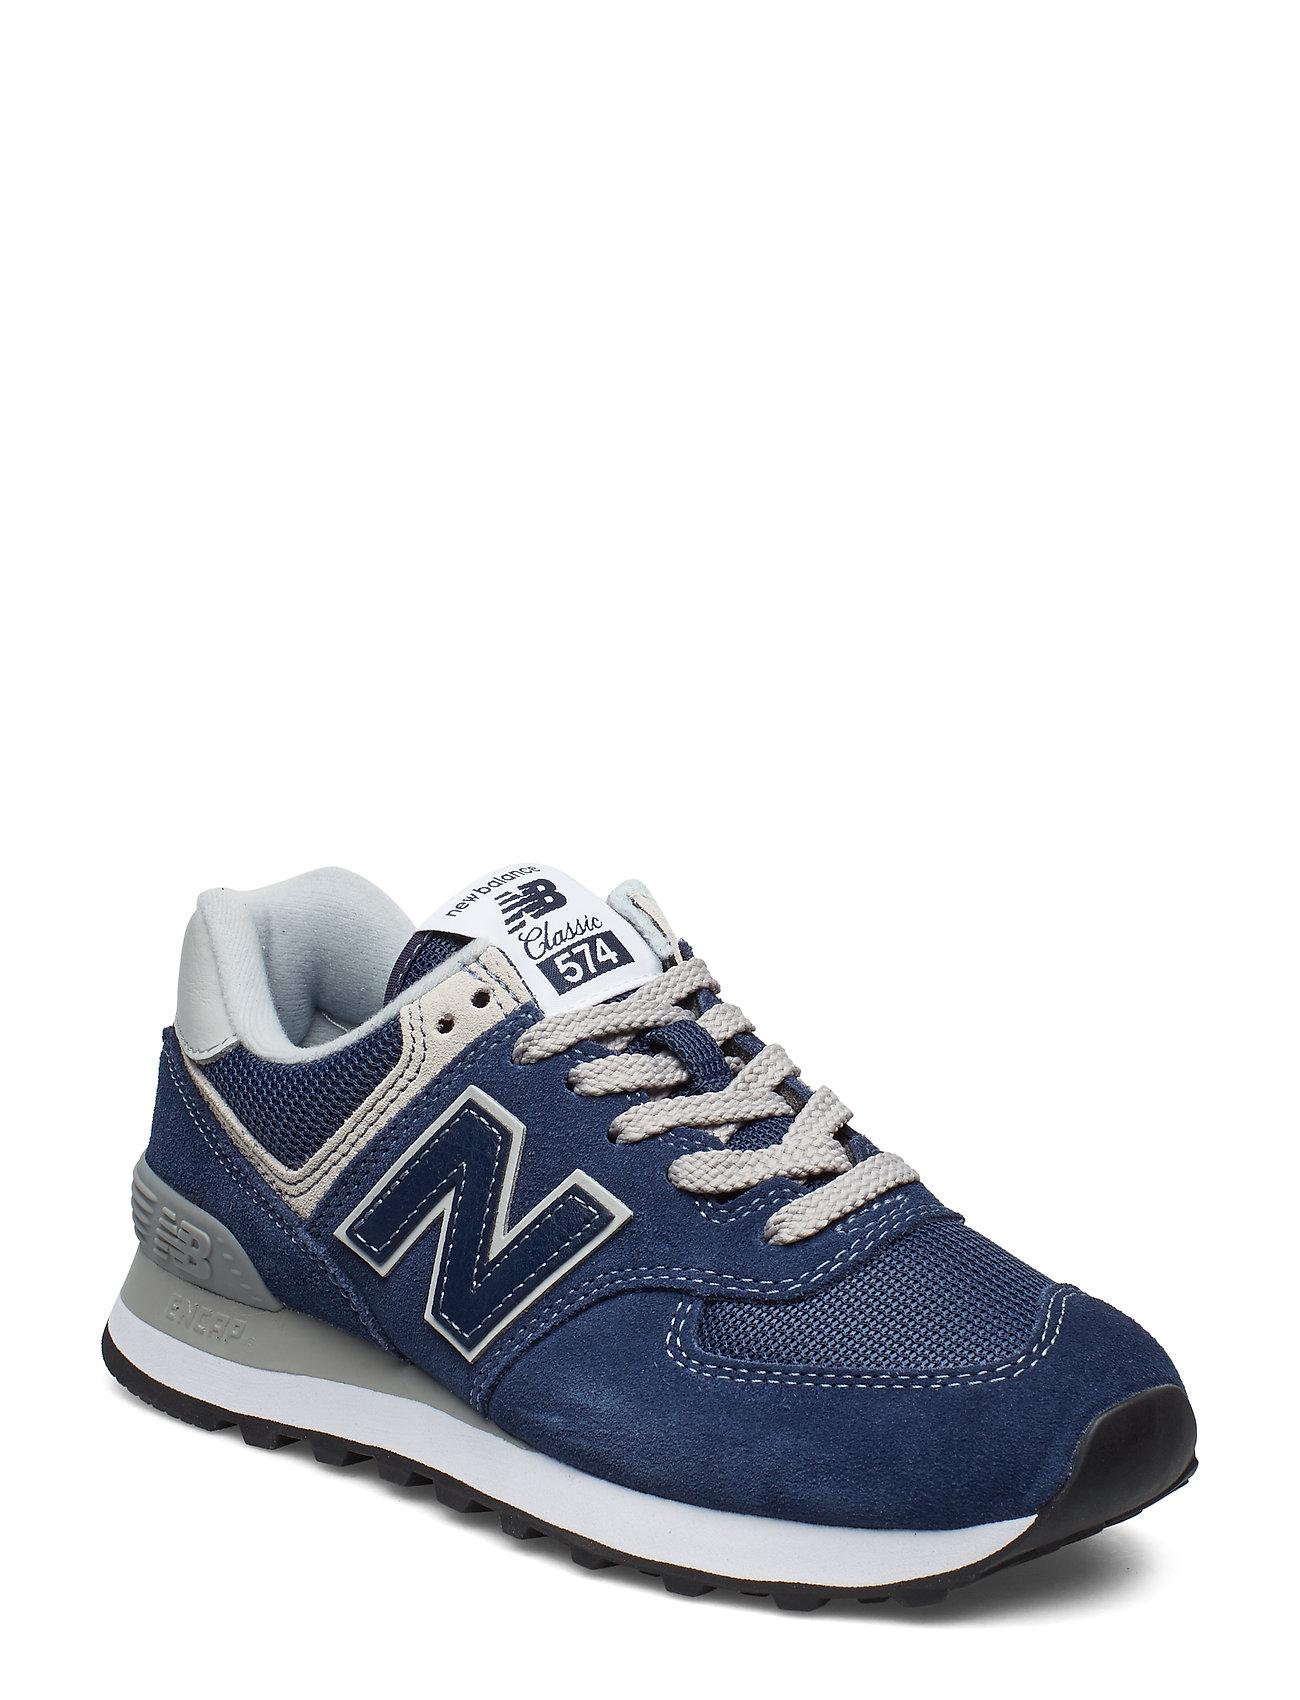 NEW BALANCE Wl574en Niedrige Sneaker Blau NEW BALANCE